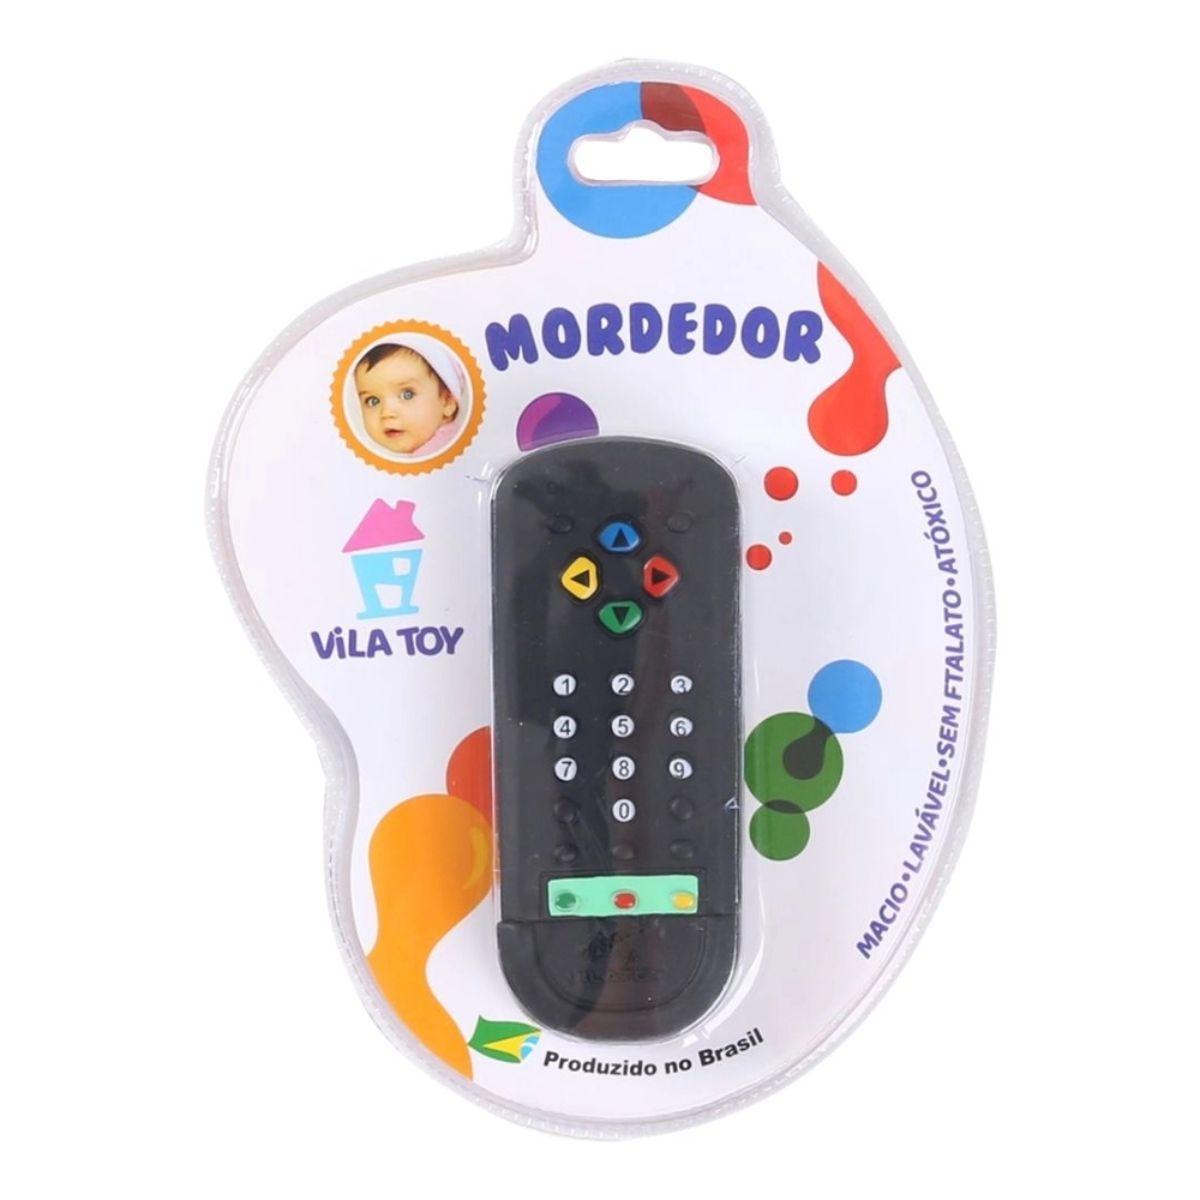 Mordedor de Controle Vila Toys Preto macio para Bebê